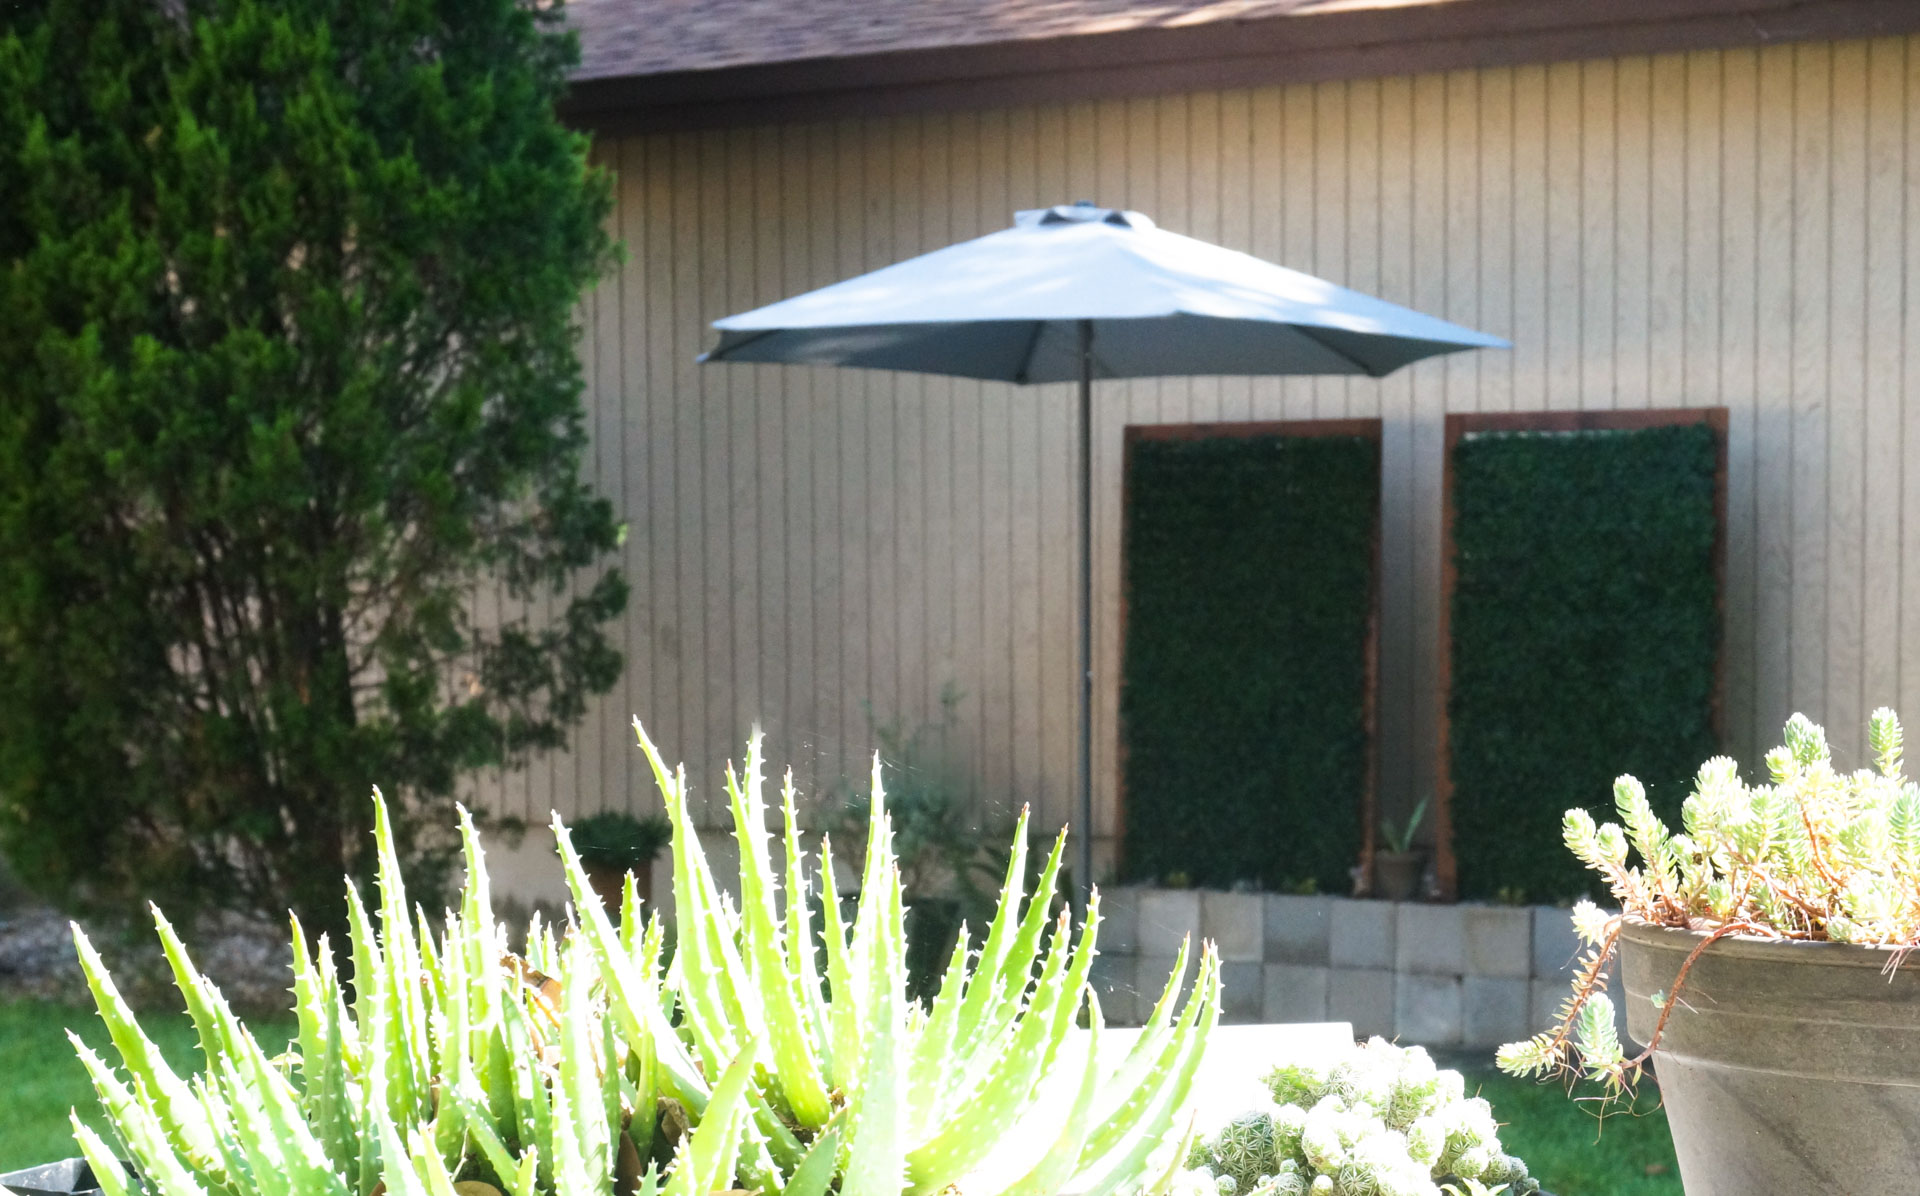 Potted plants, trellises and patio umbrella shade